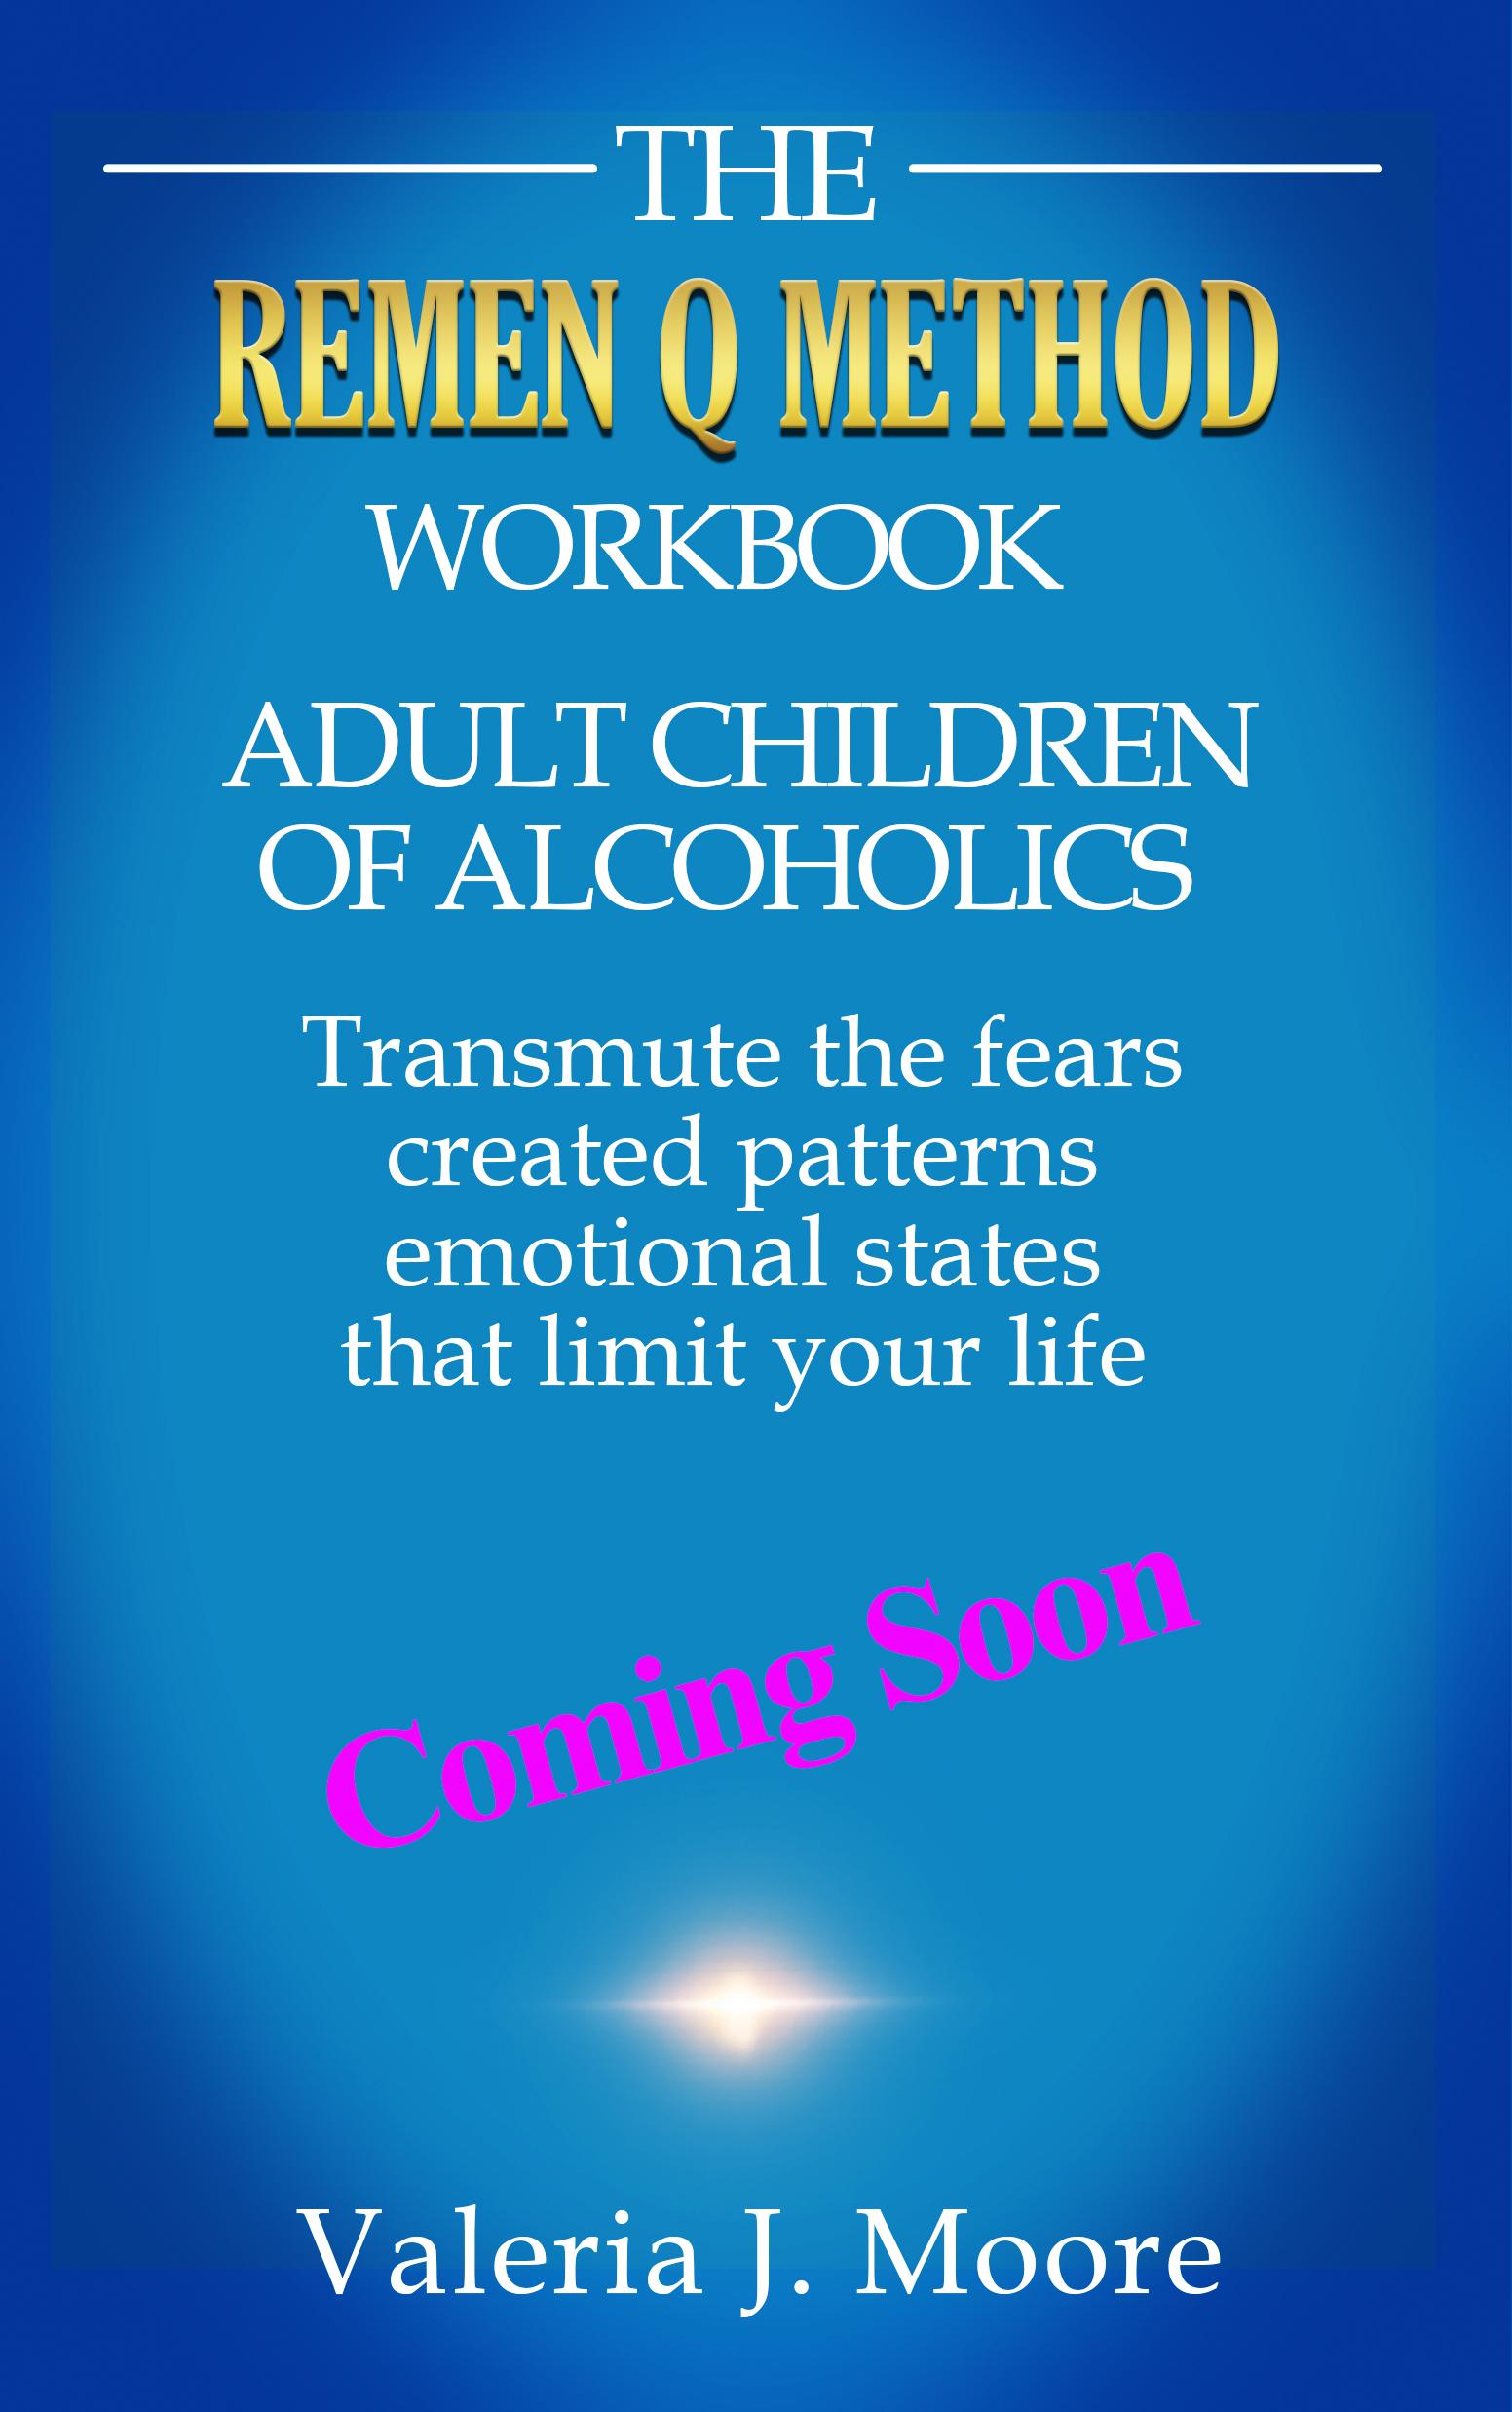 Remen Q book workbook template ACOA